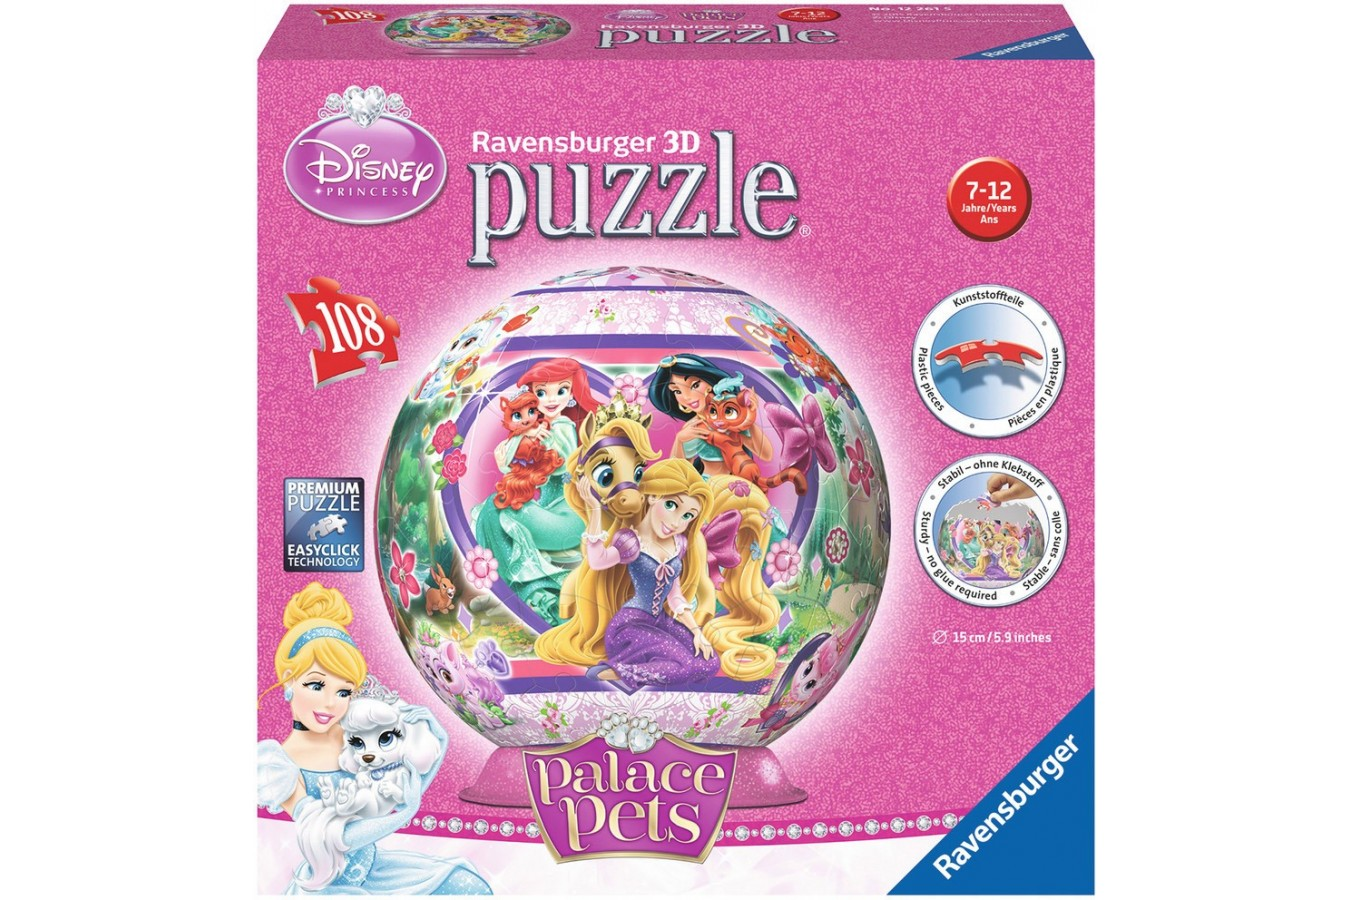 Puzzle glob Ravensburger - Palace Pets, 108 piese (12261)